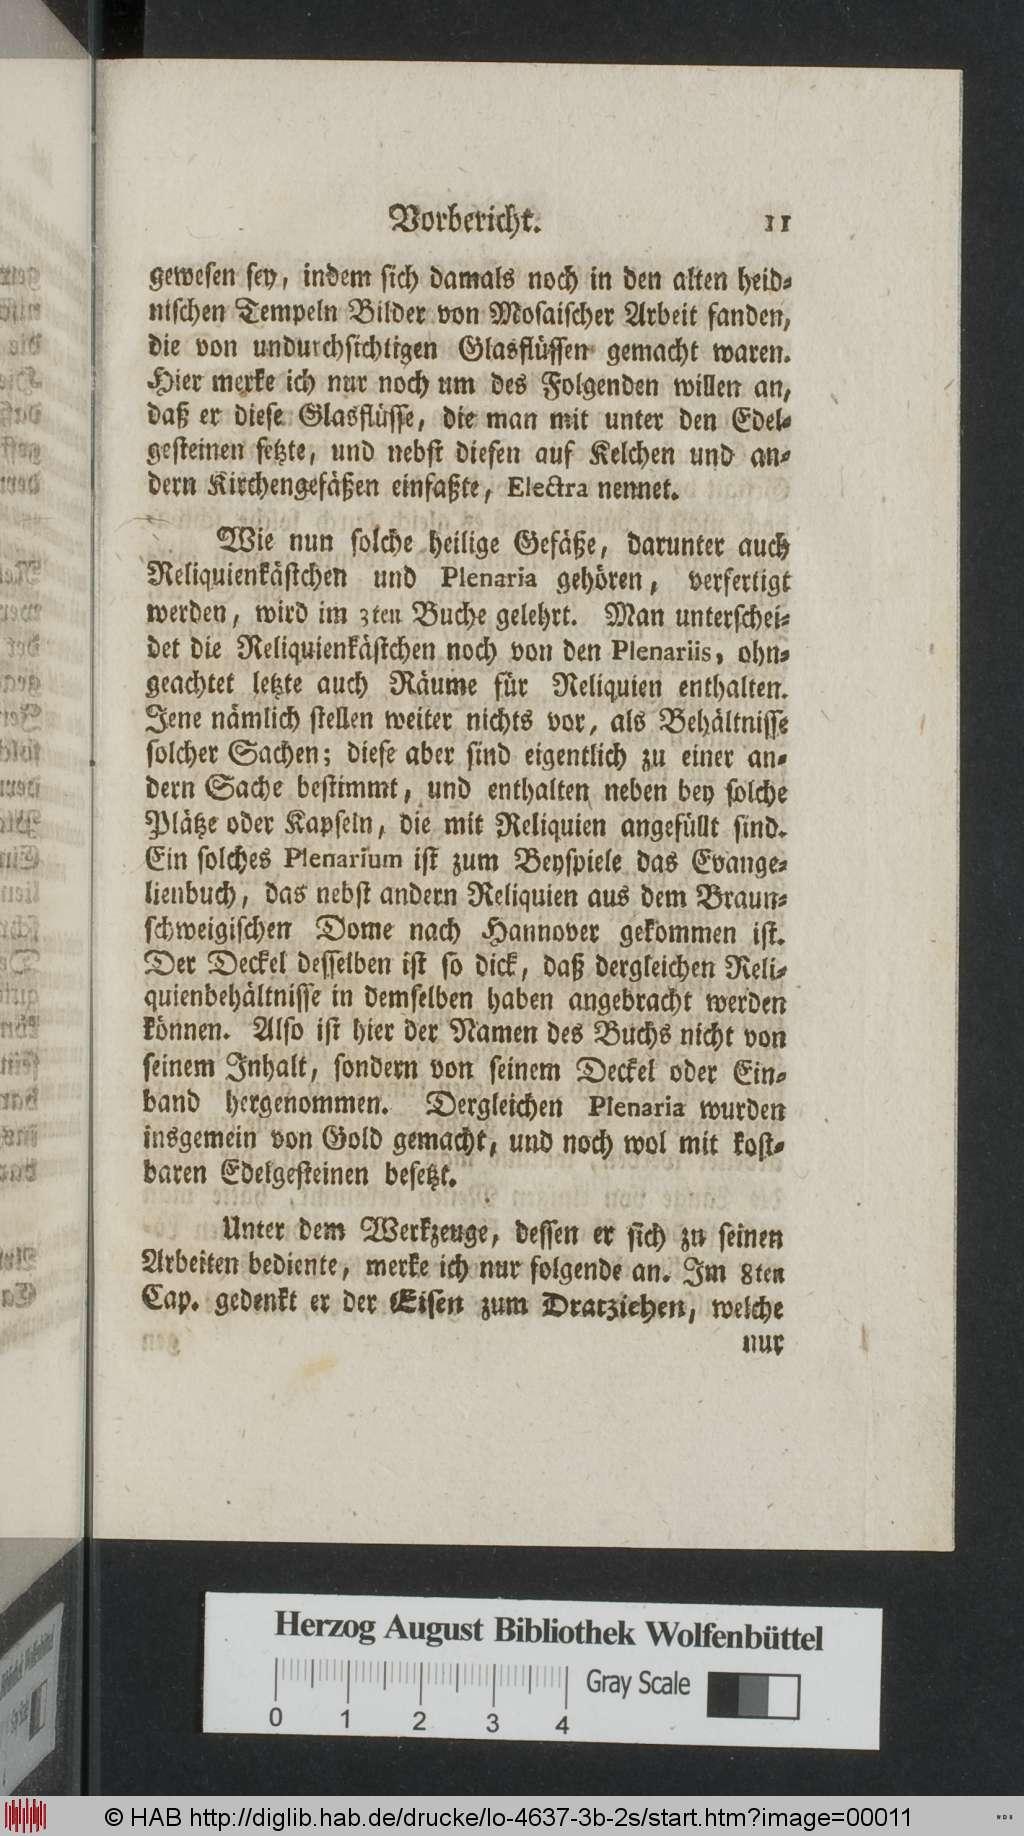 http://diglib.hab.de/drucke/lo-4637-3b-2s/00011.jpg